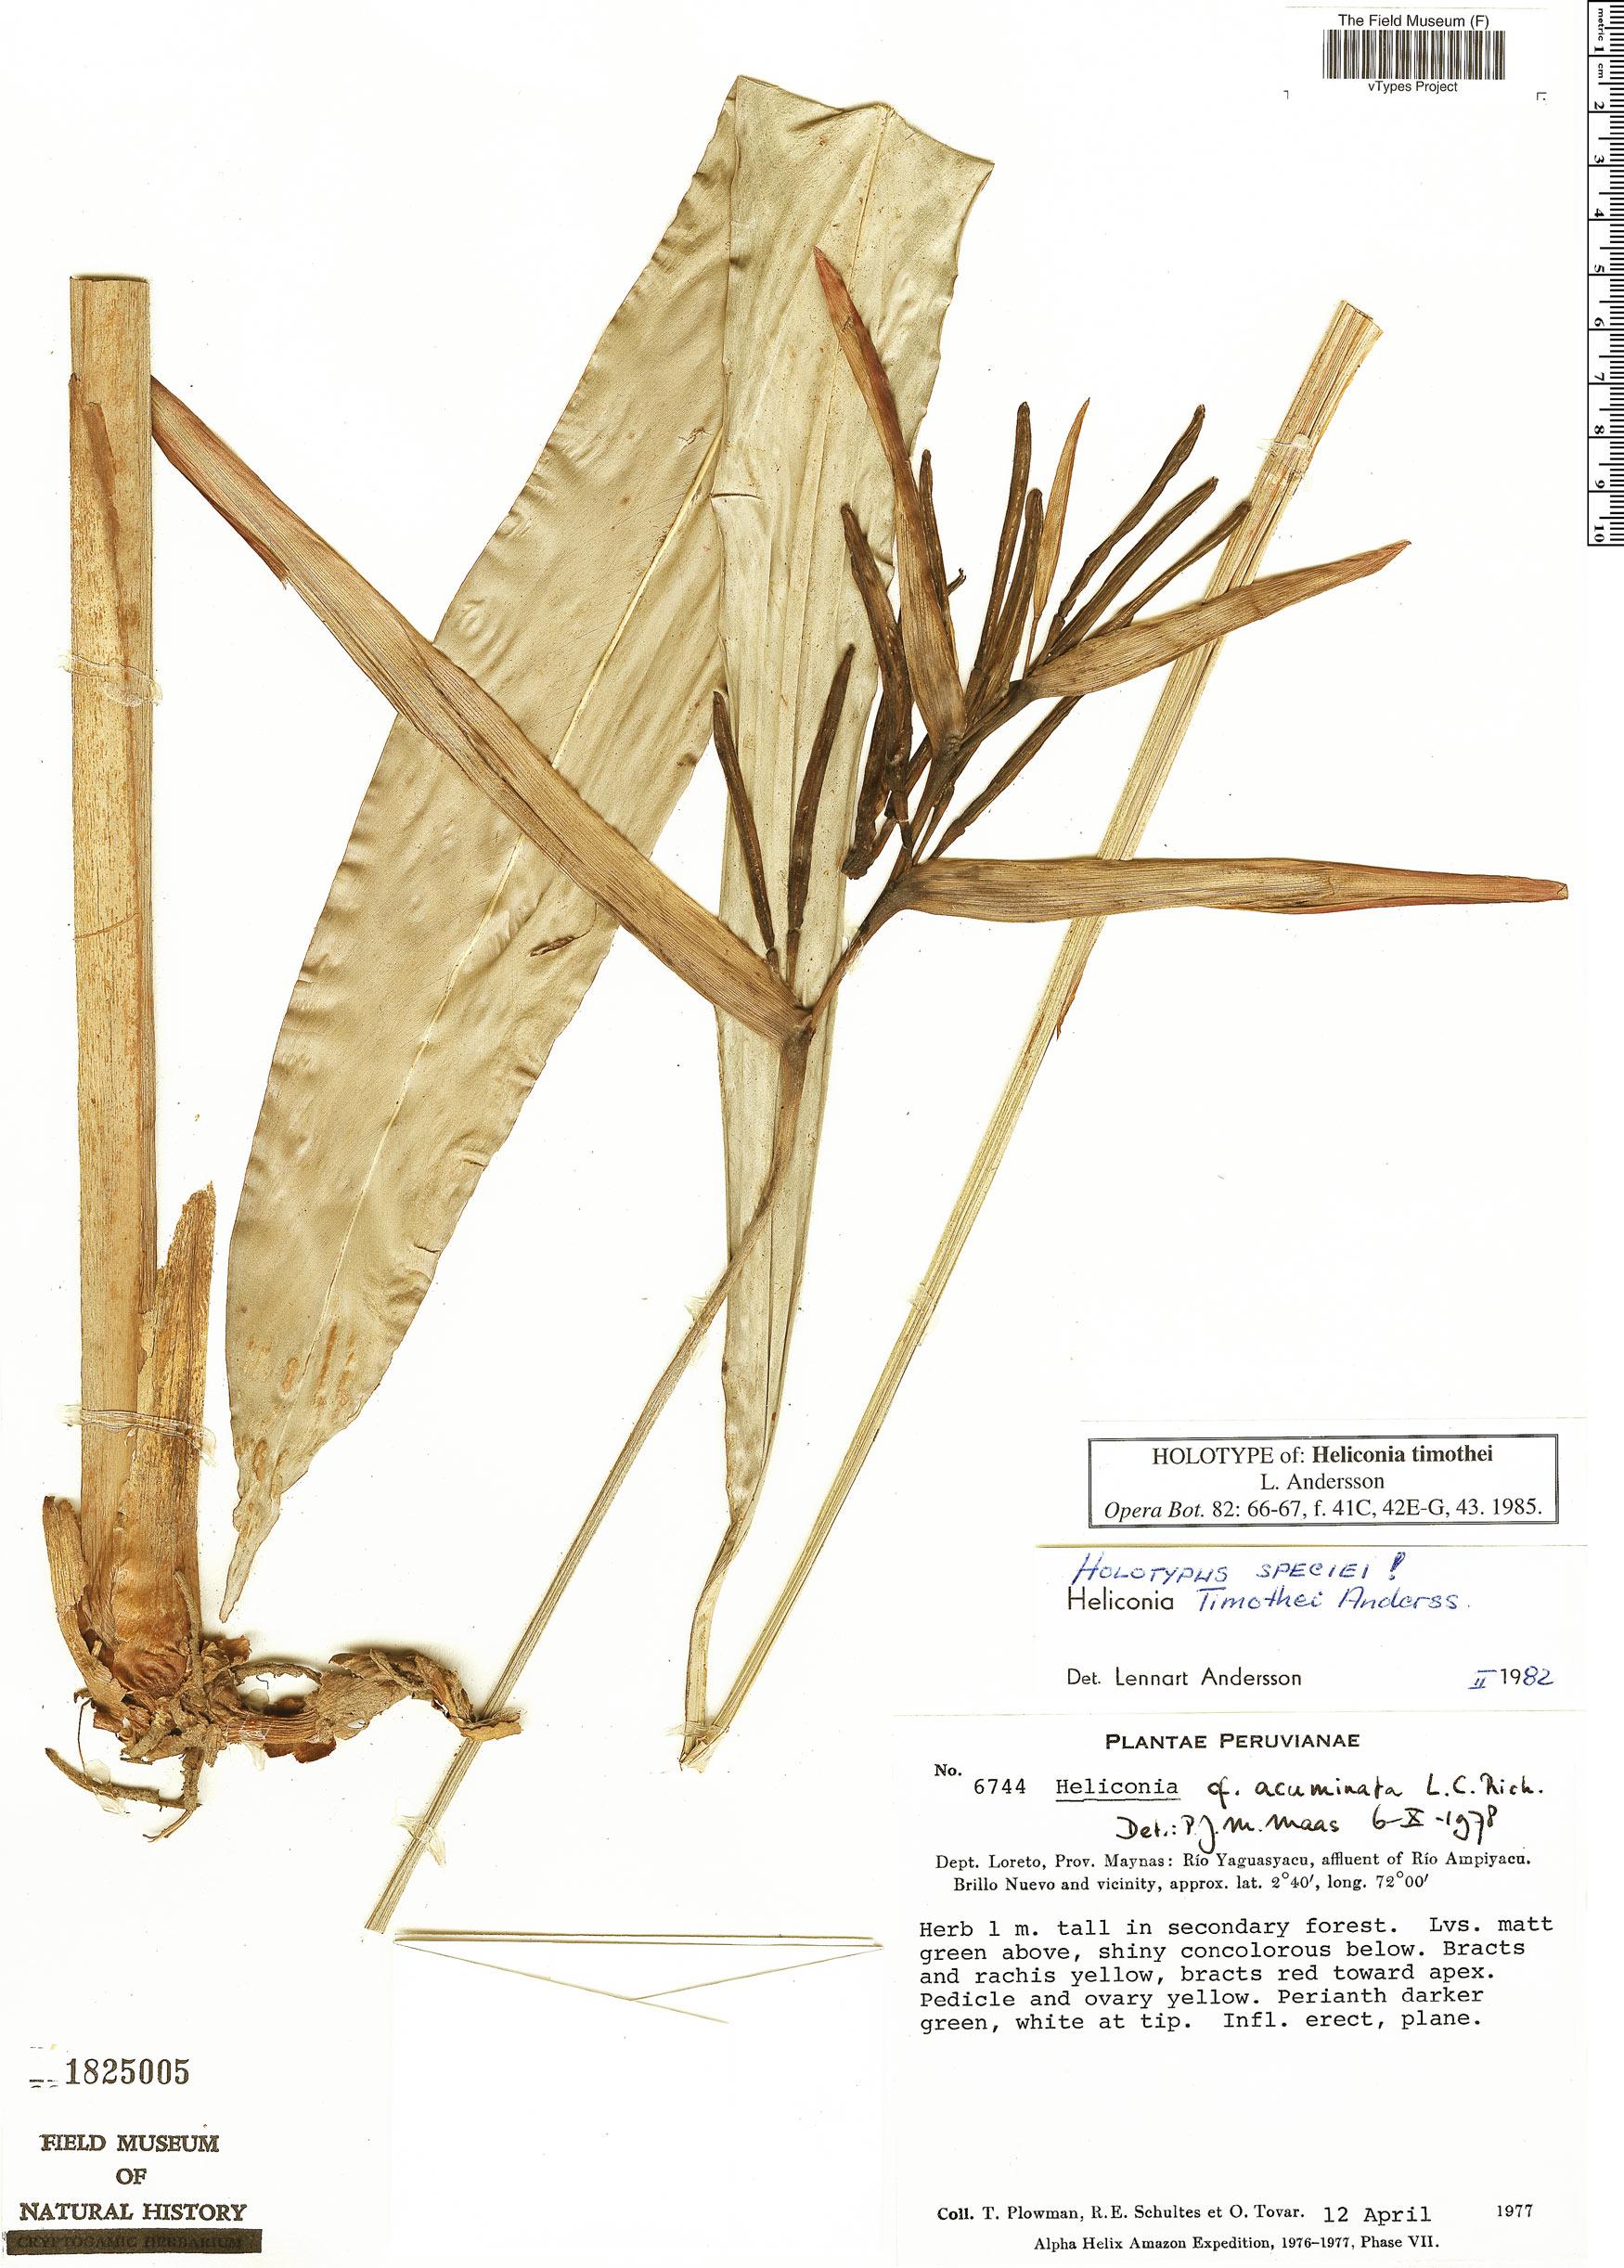 Specimen: Heliconia timothei